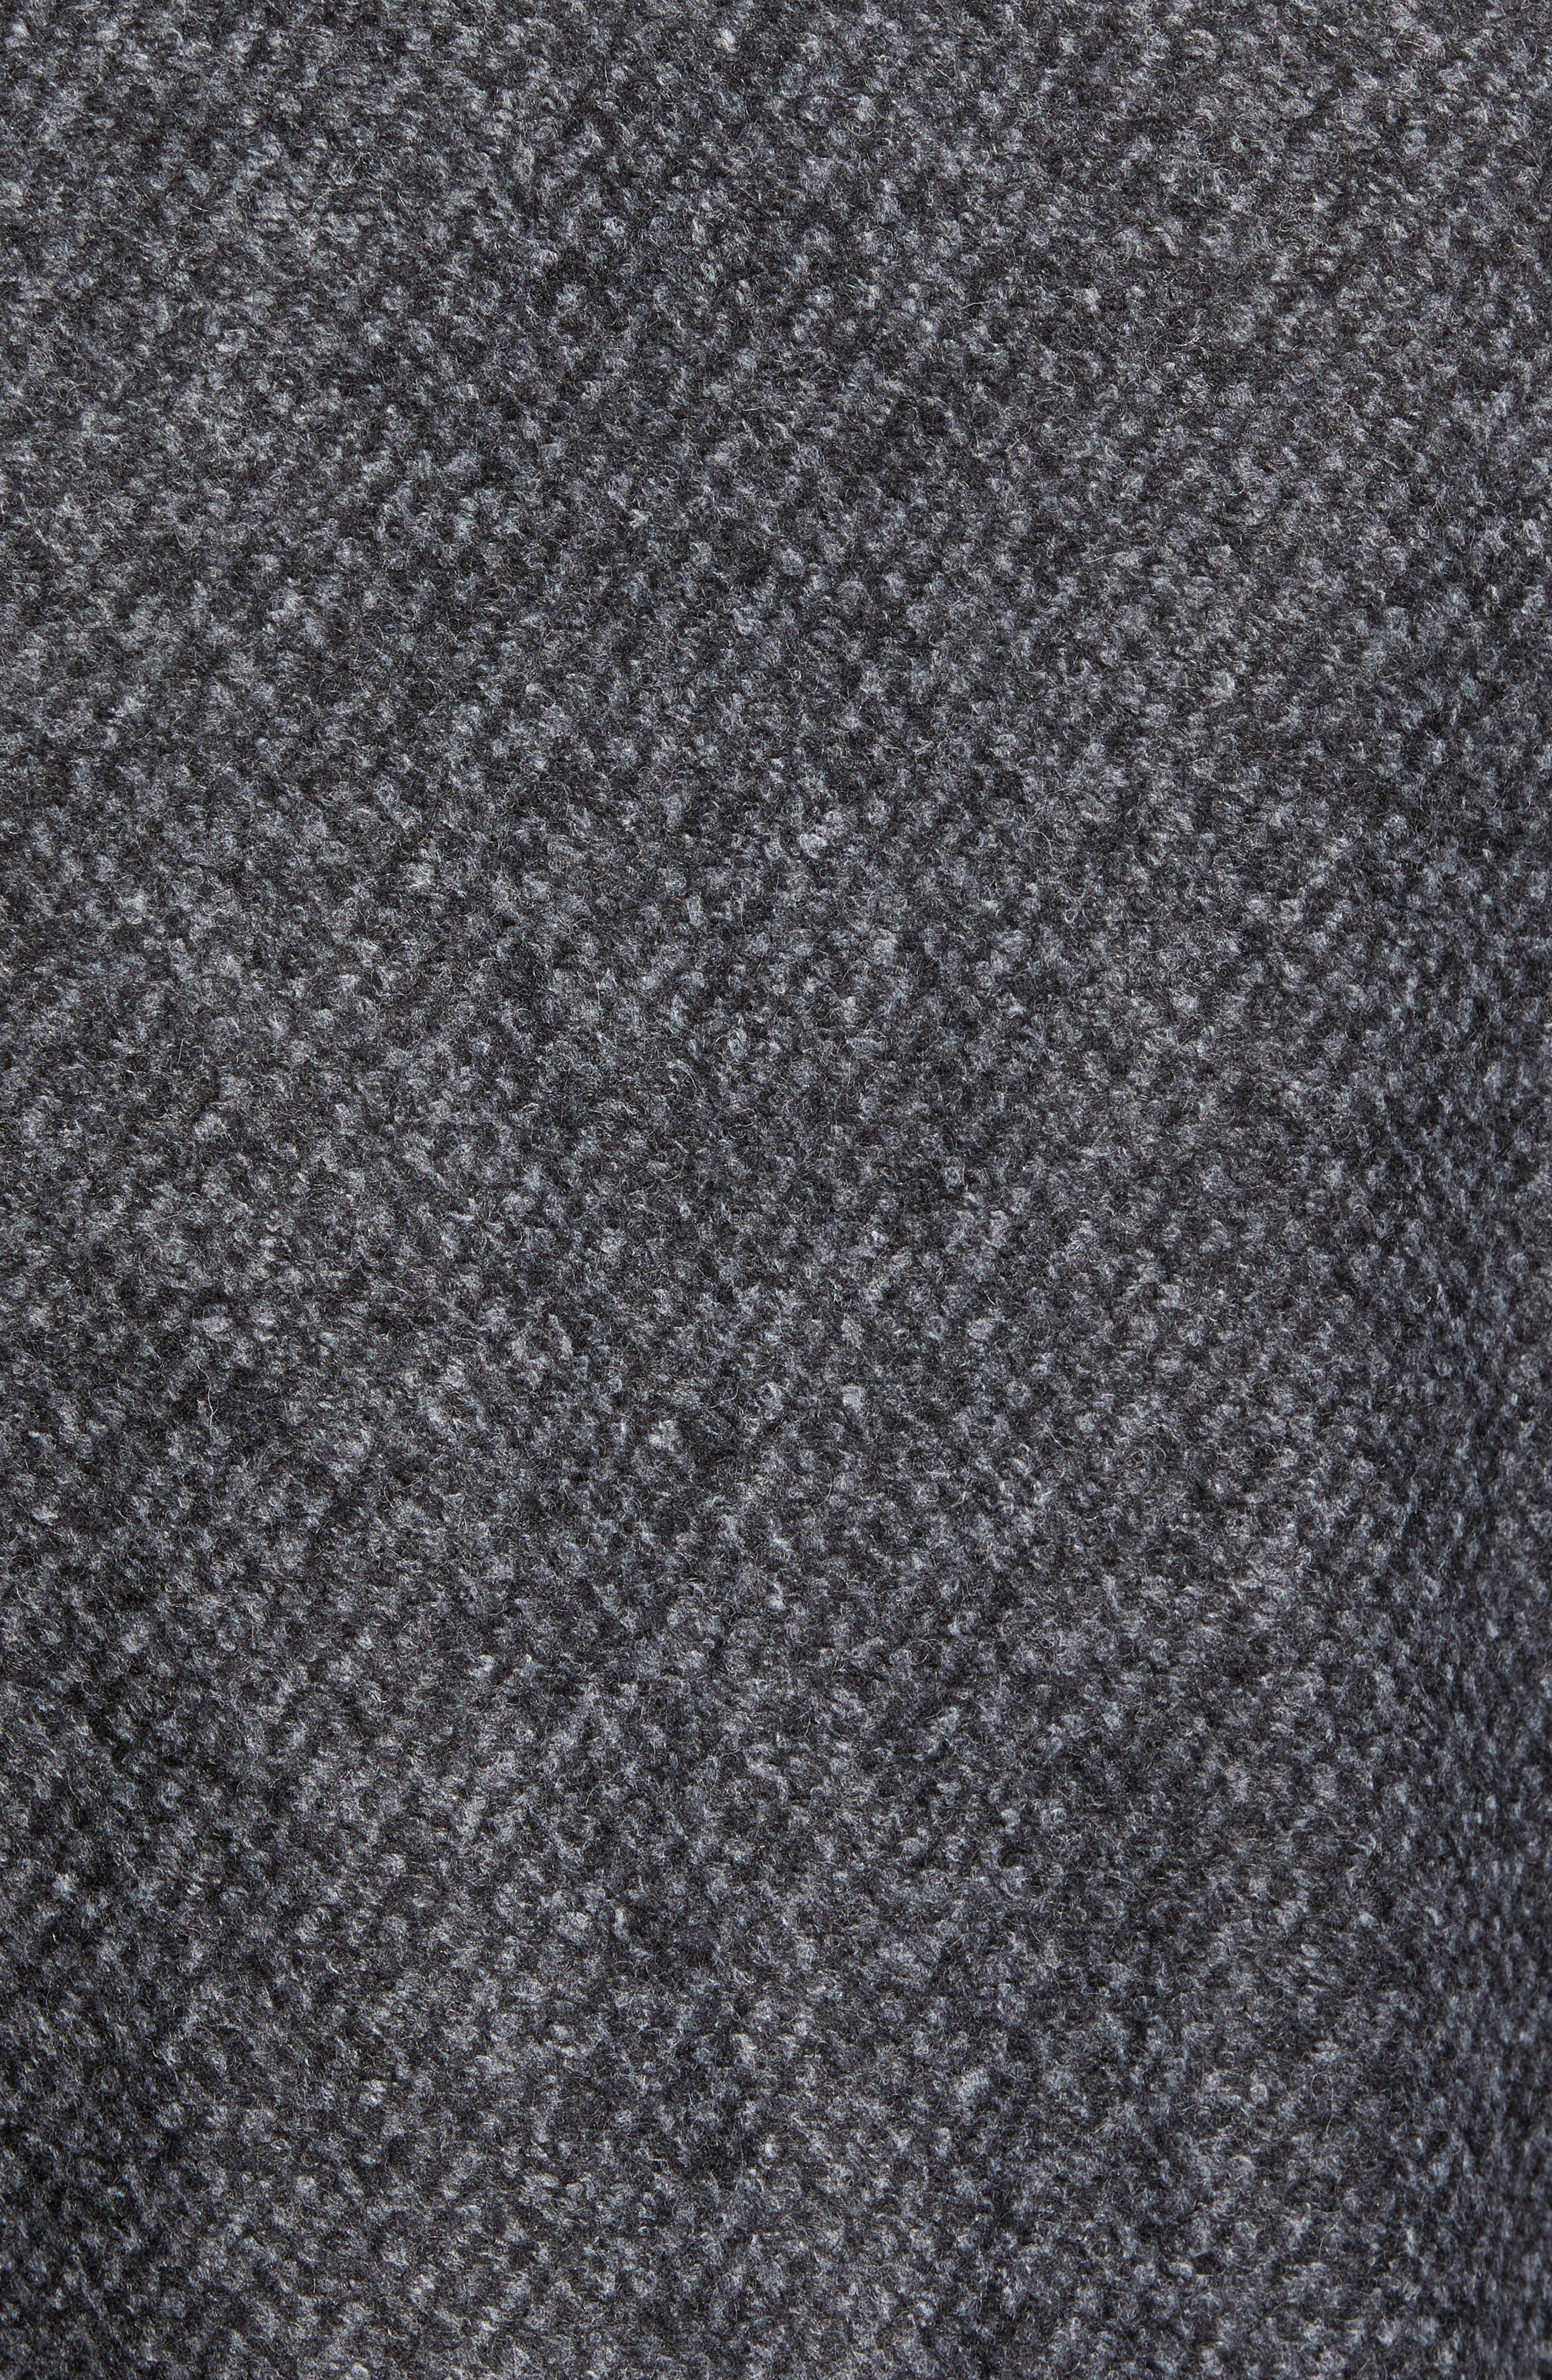 Salea Slim Fit Bomber Jacket,                             Alternate thumbnail 5, color,